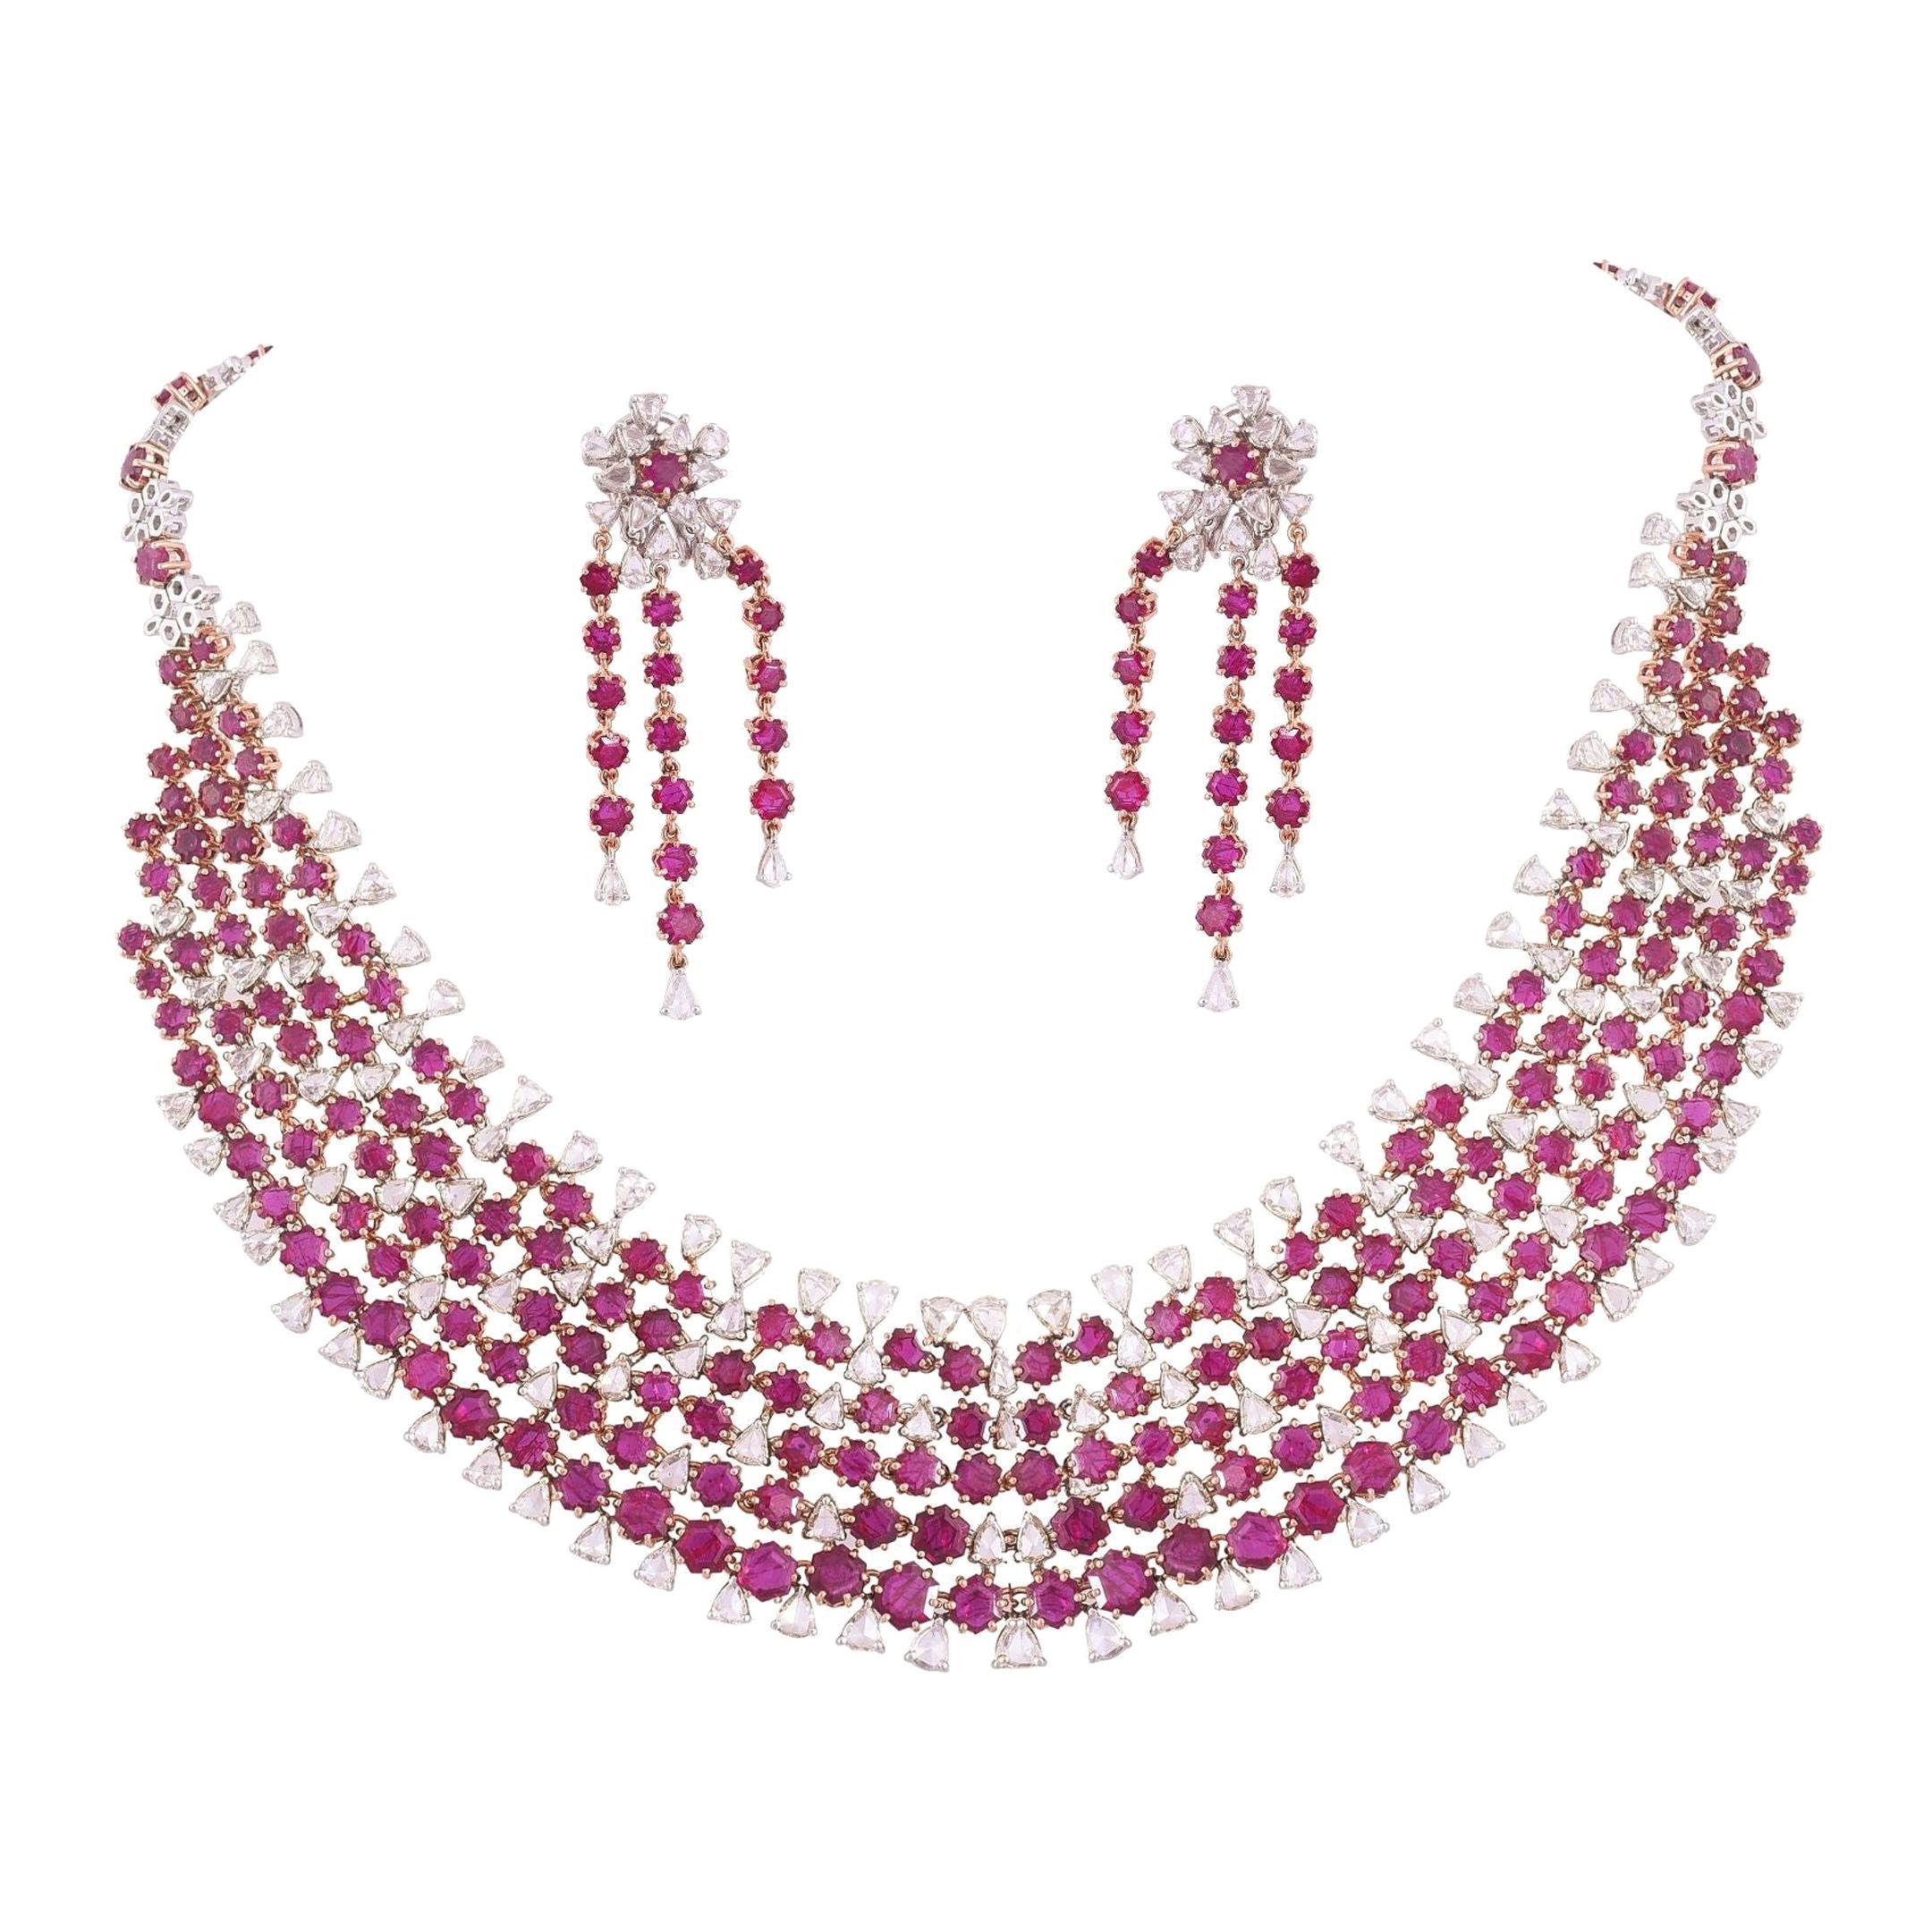 Natural Ruby & Rose Cut Diamonds Choker Necklace Set & Earrings In 18 Karat Gold